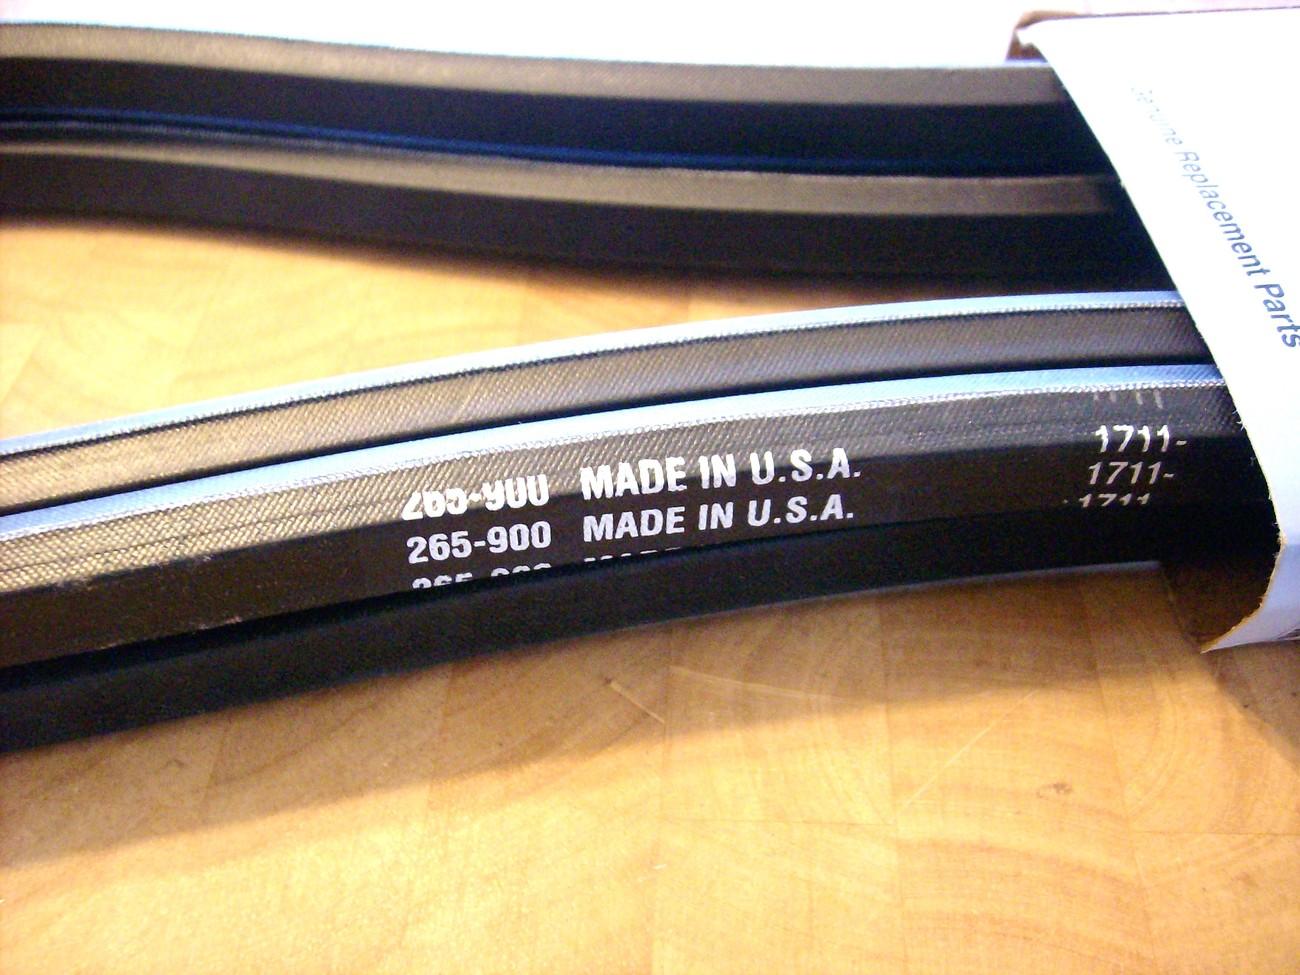 Toro Groundmaster 580D main drive belt 69-6220 / 93-8457